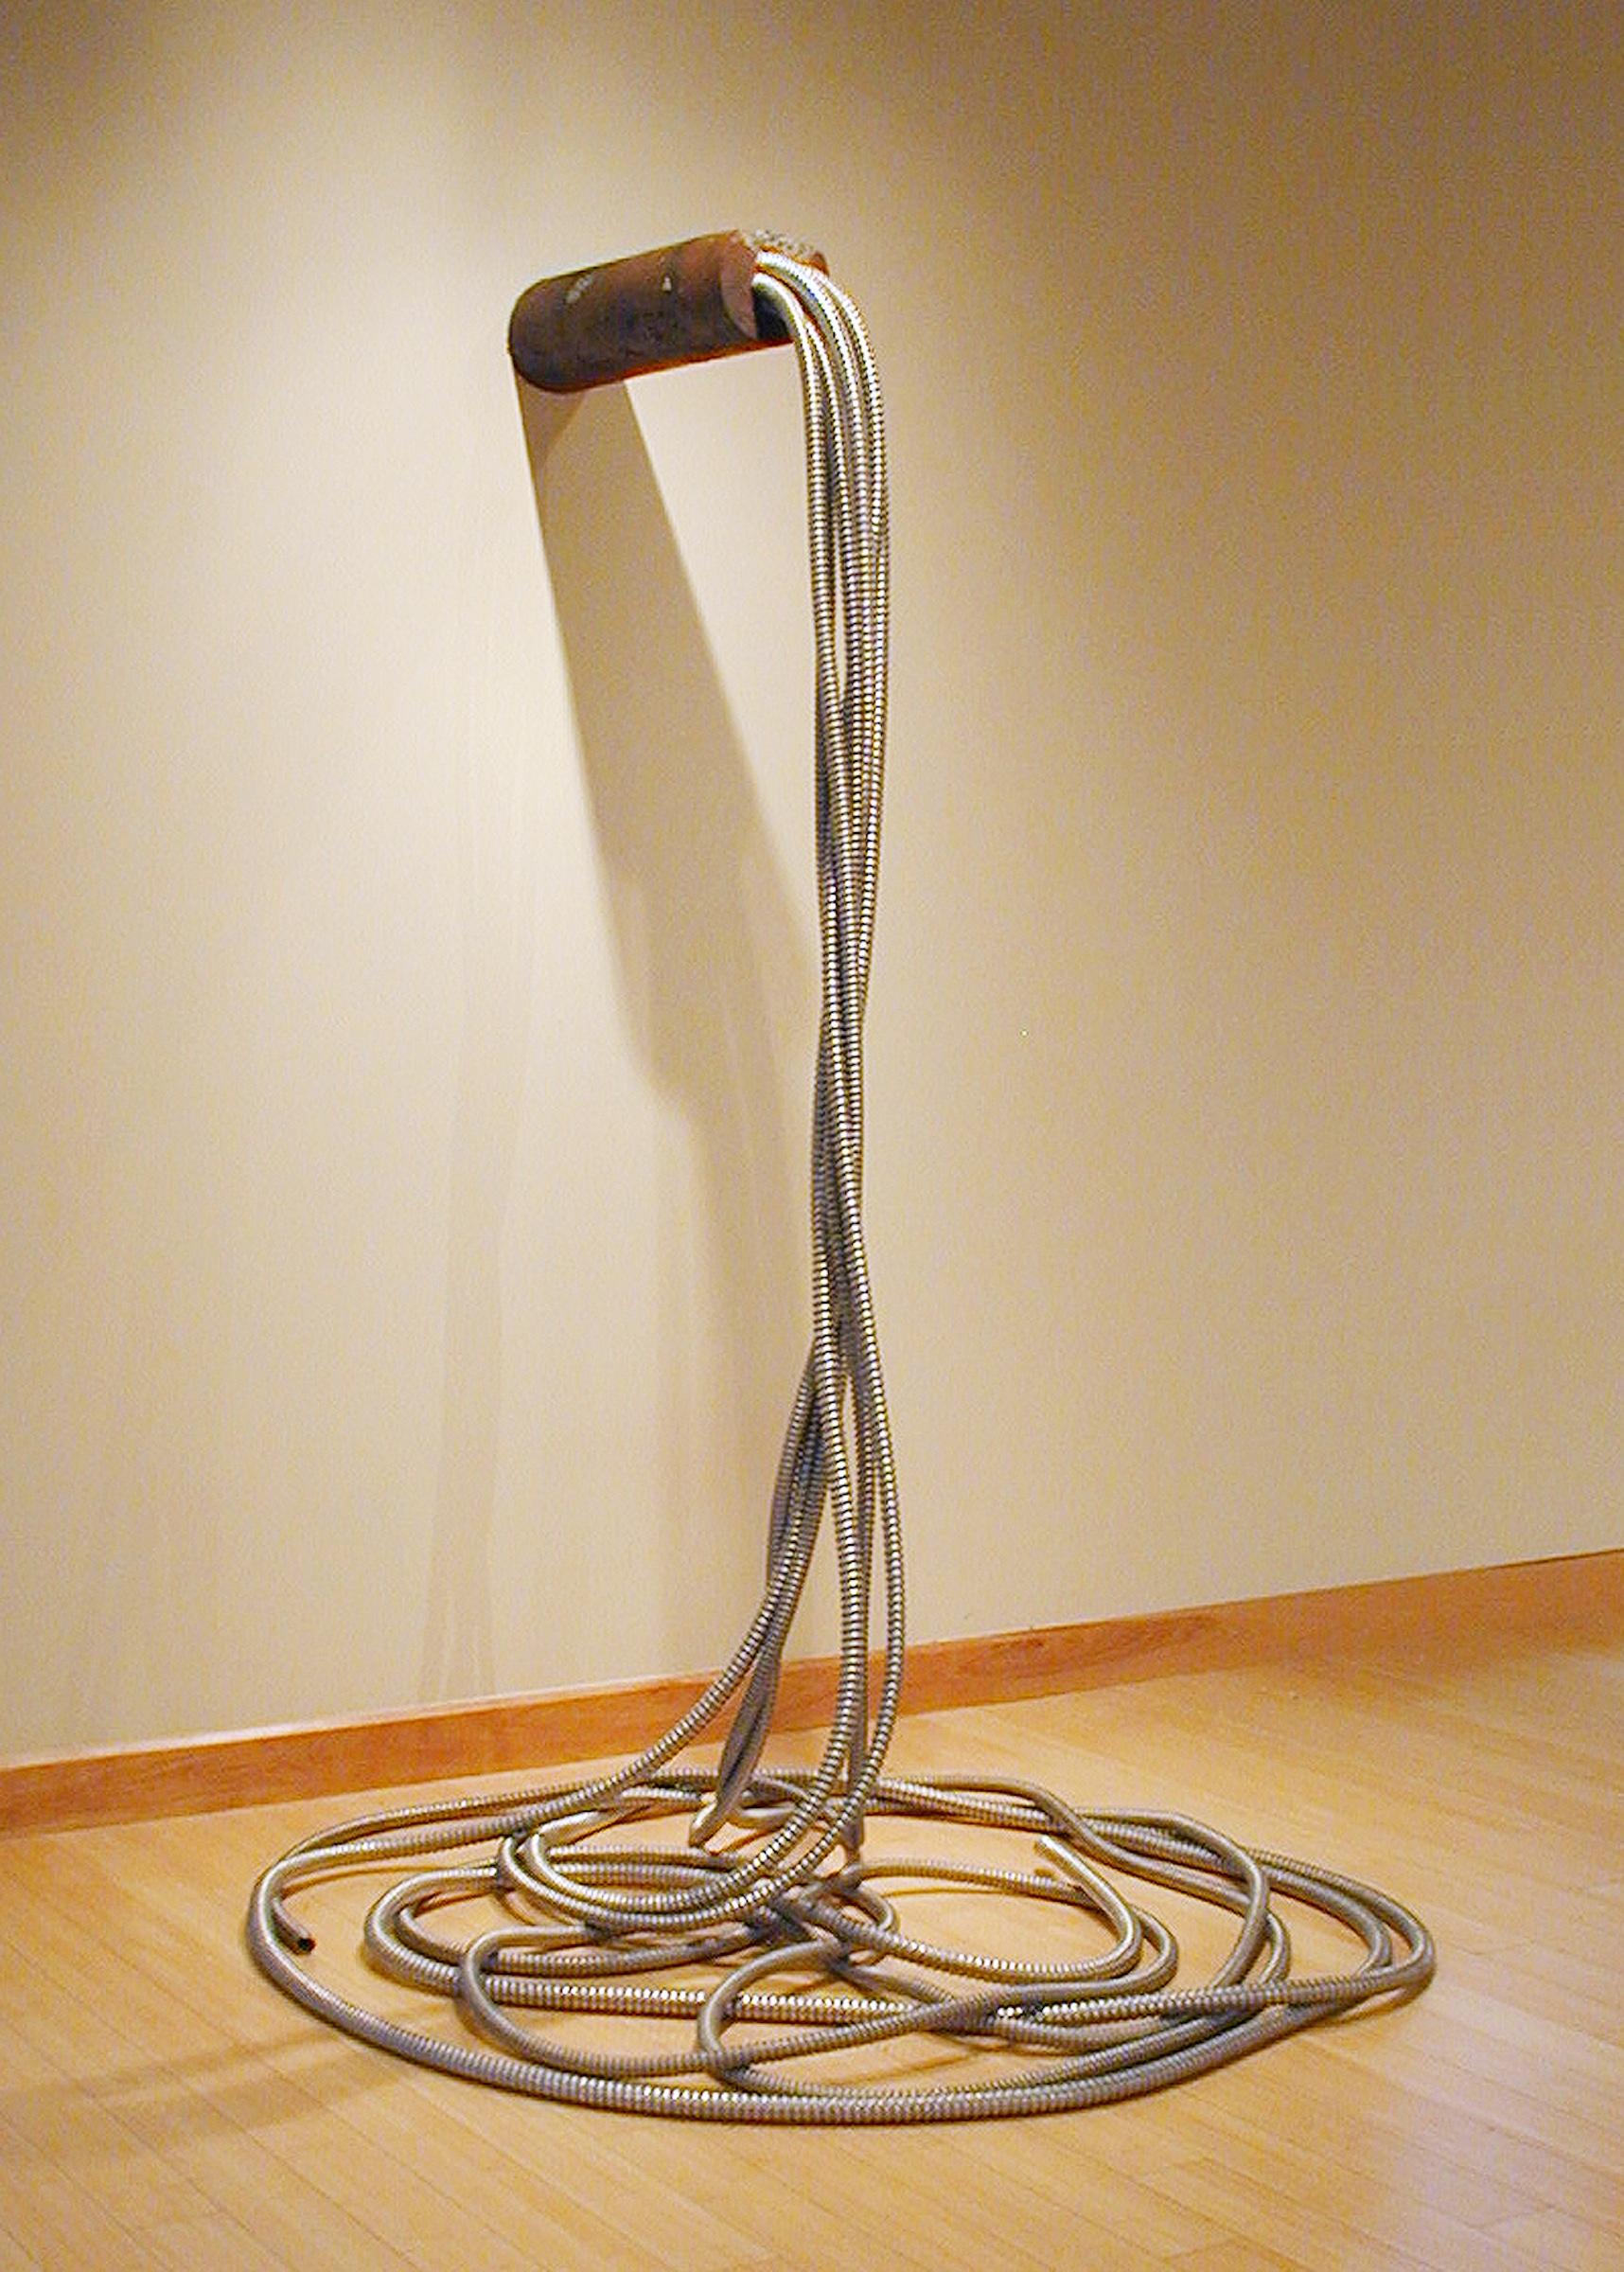 Vena Cava , 2010,   cast concrete, pigments, and reclaimed metal, 78 x 40 x 29 inches